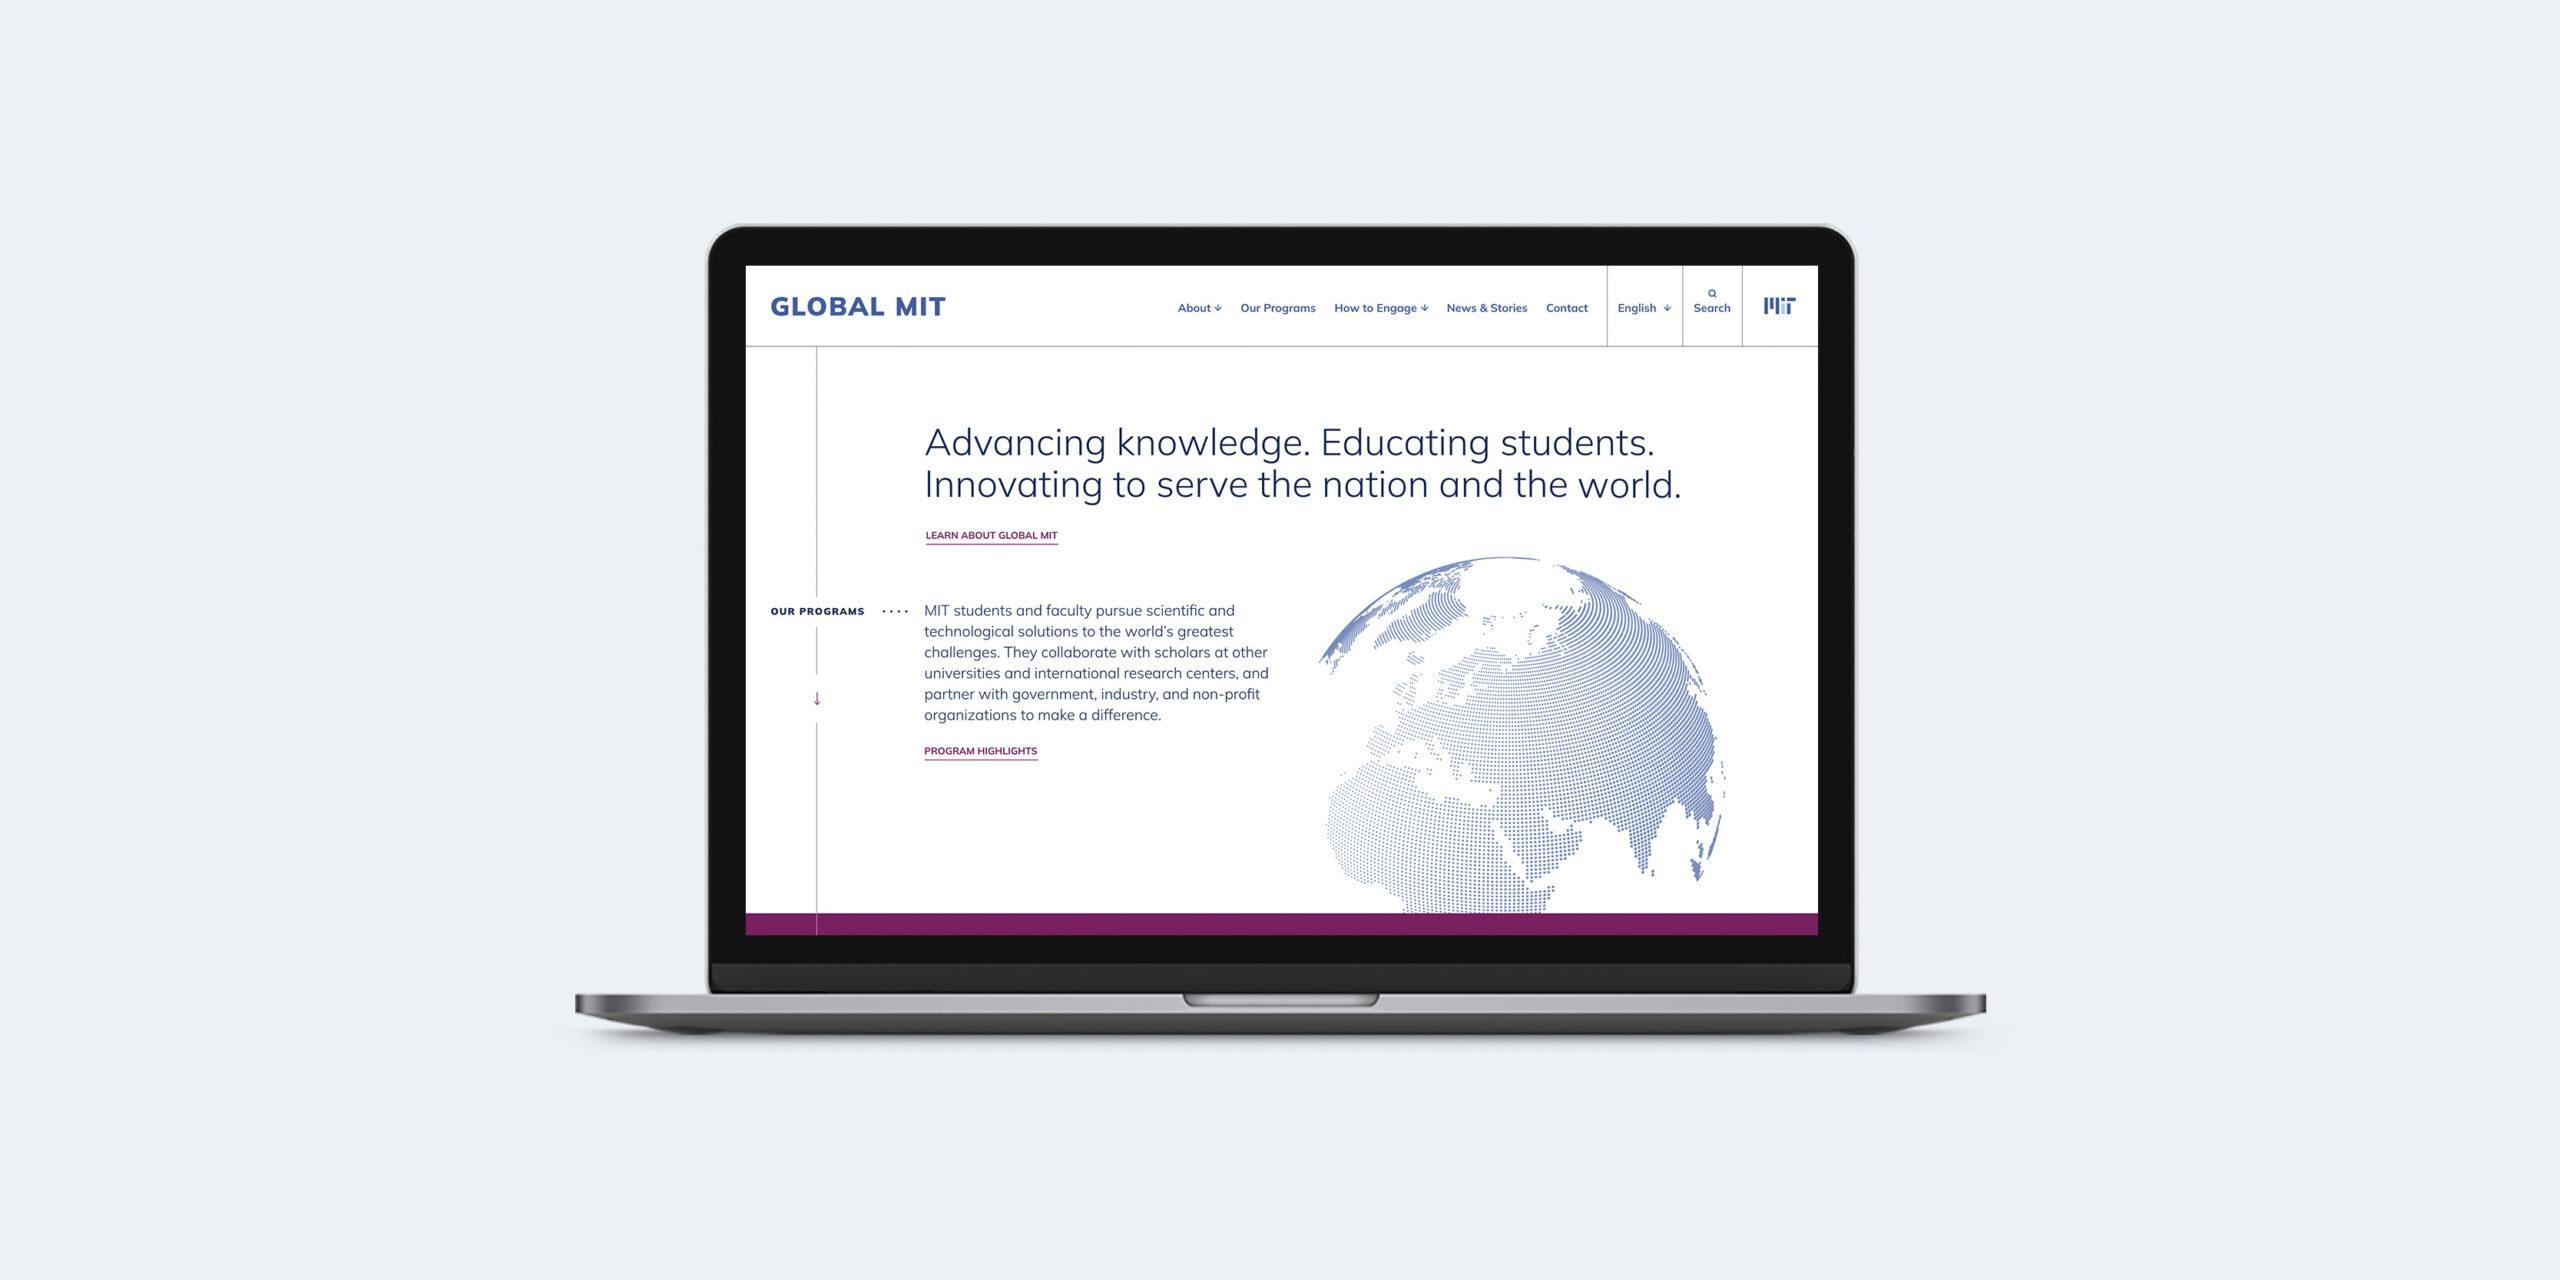 Global MIT